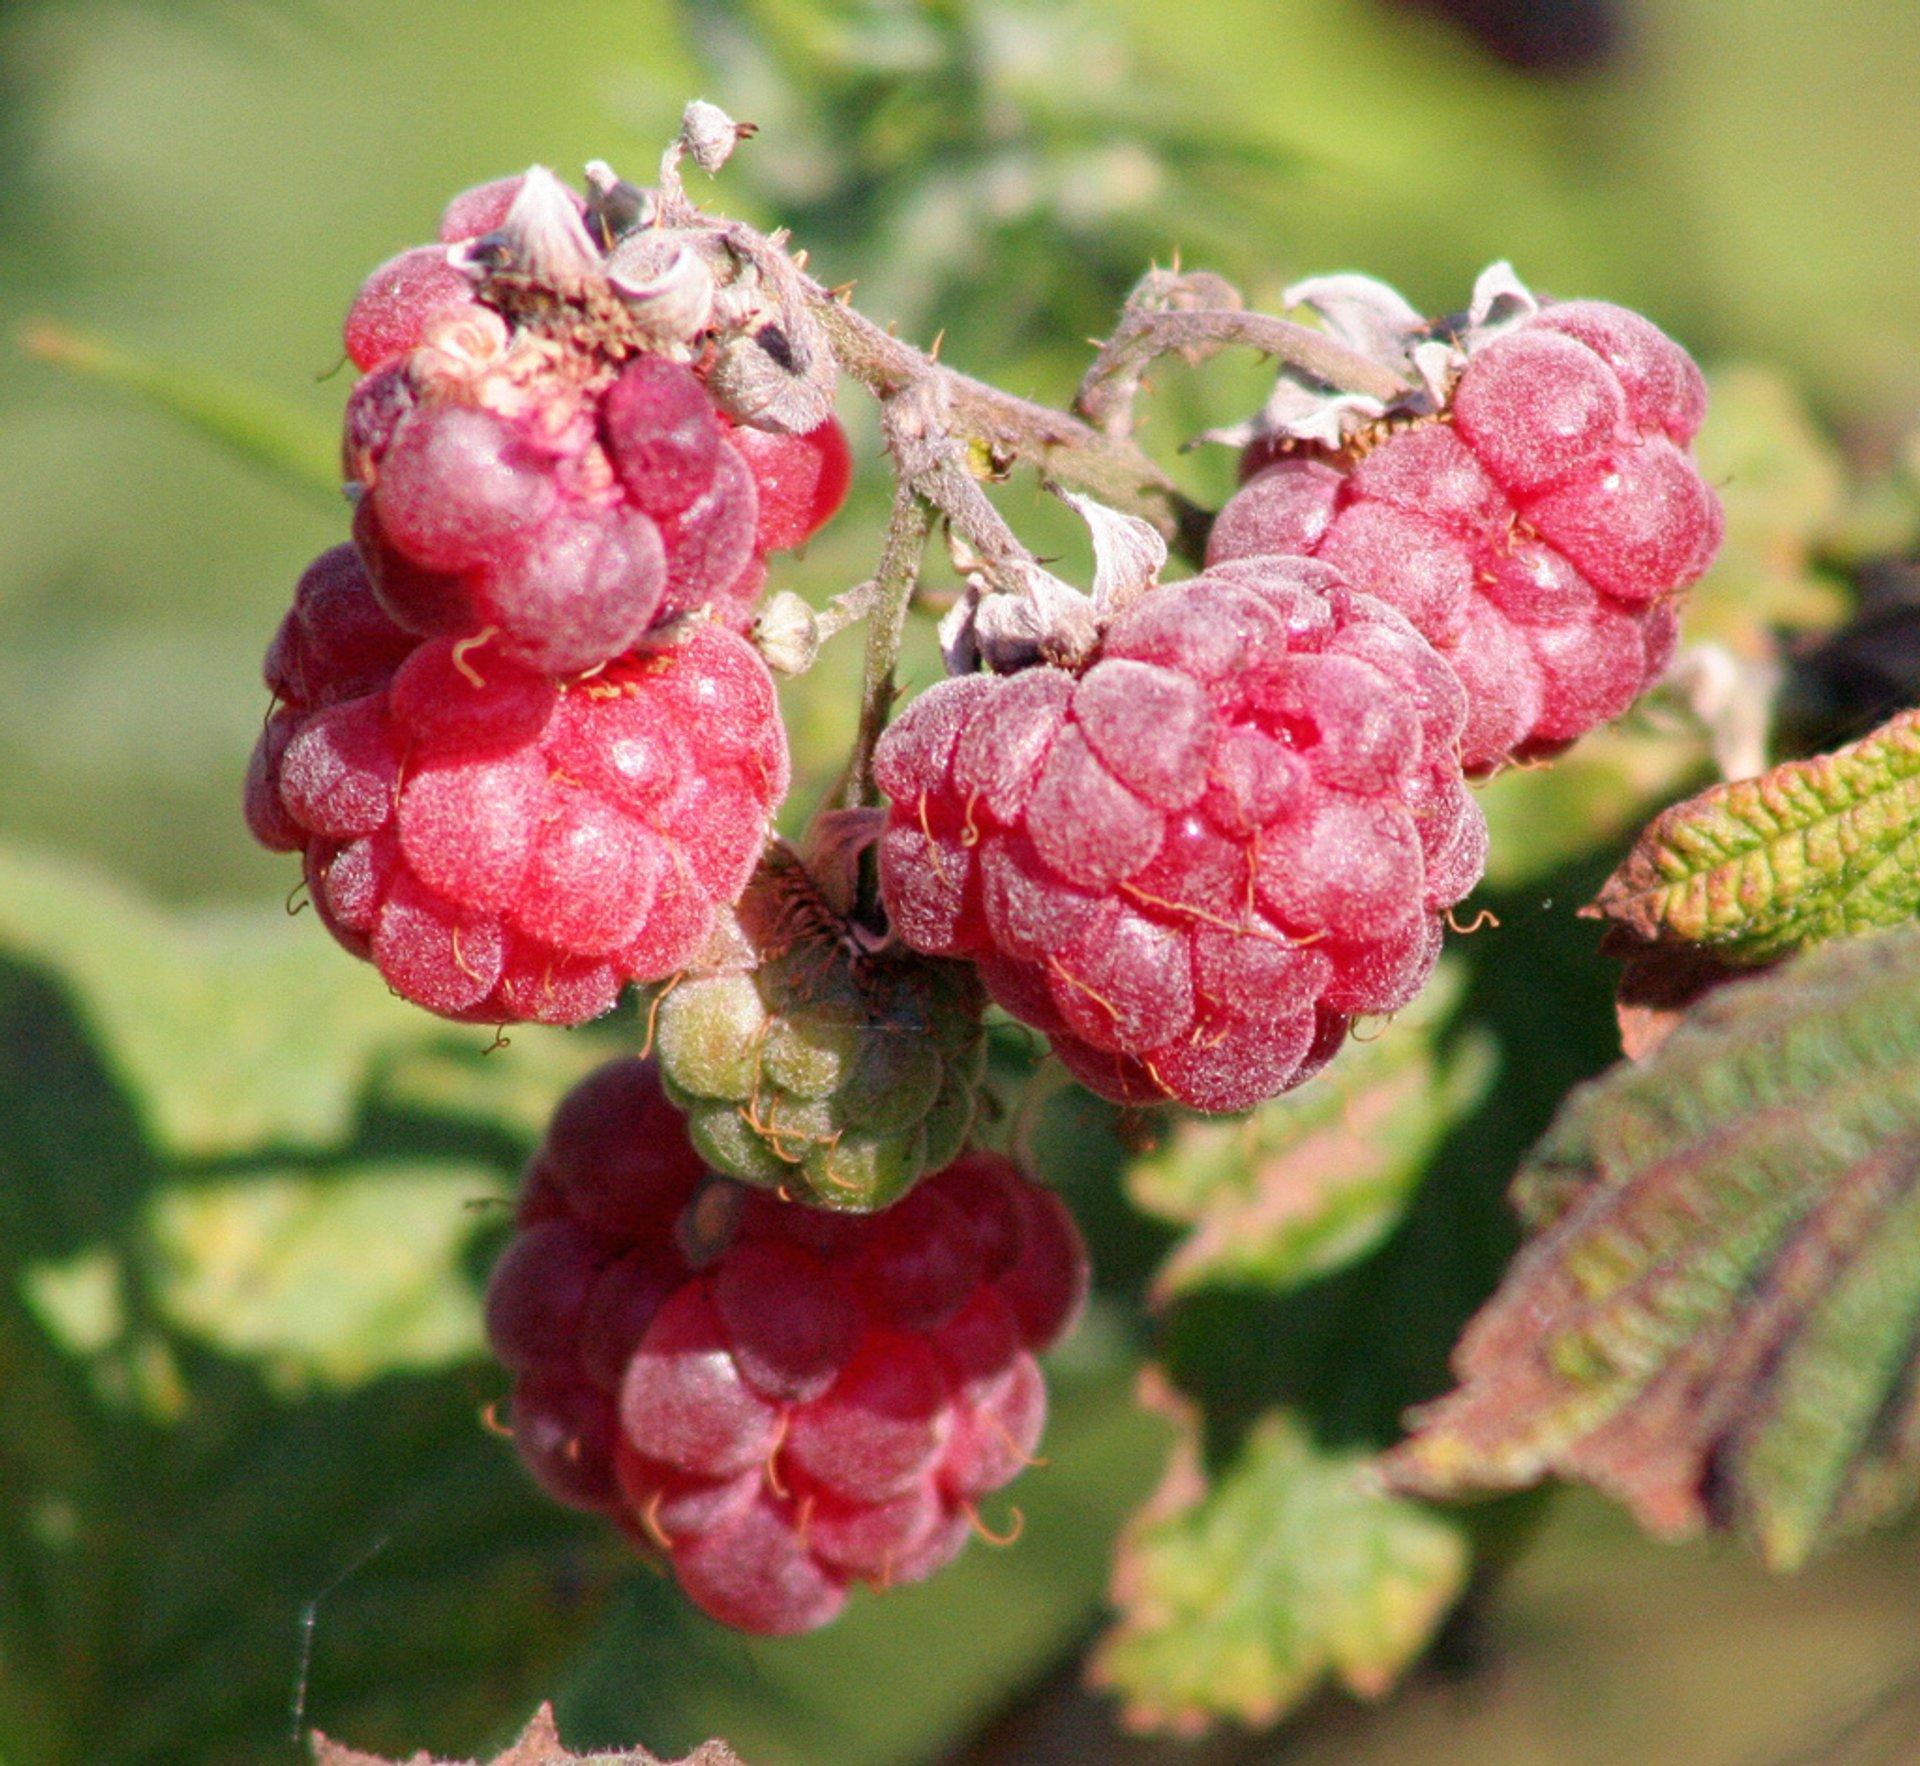 Raspberries 2020